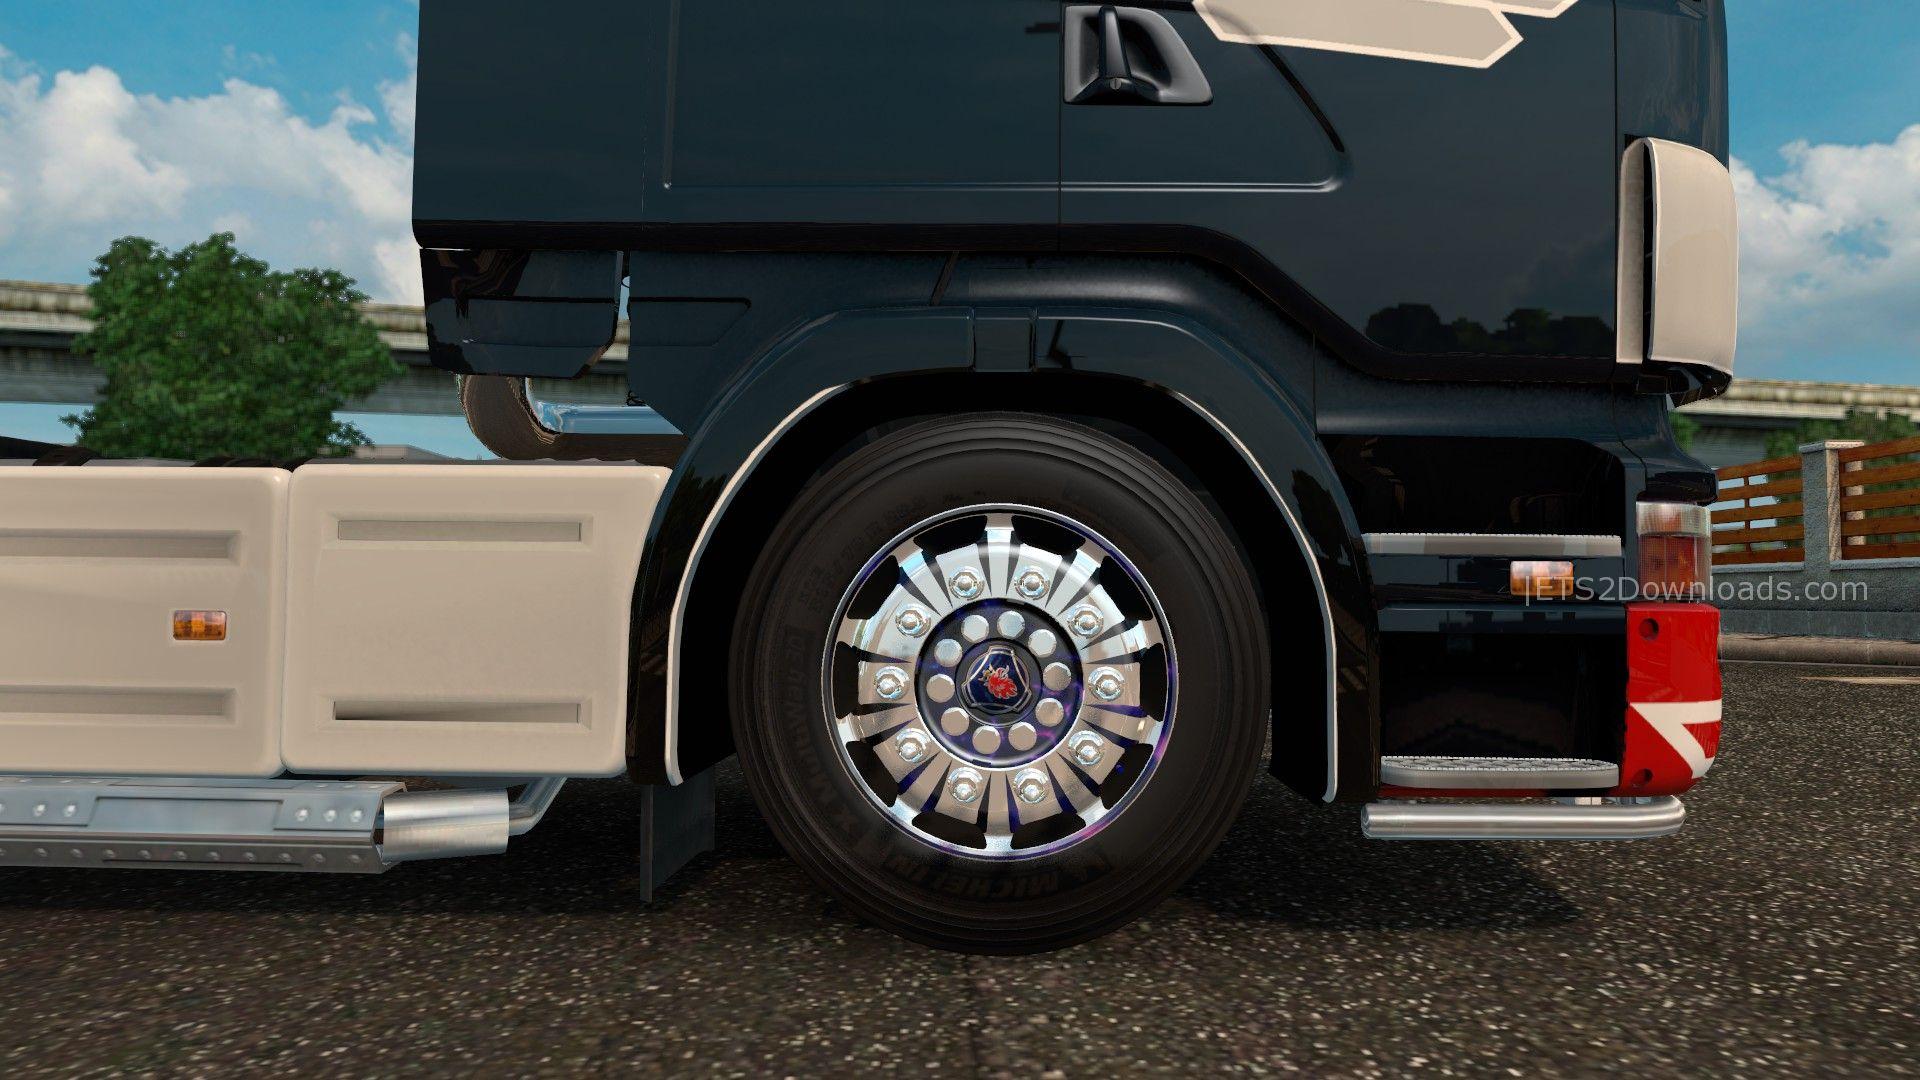 rodas-reeditadas-scania-wheel